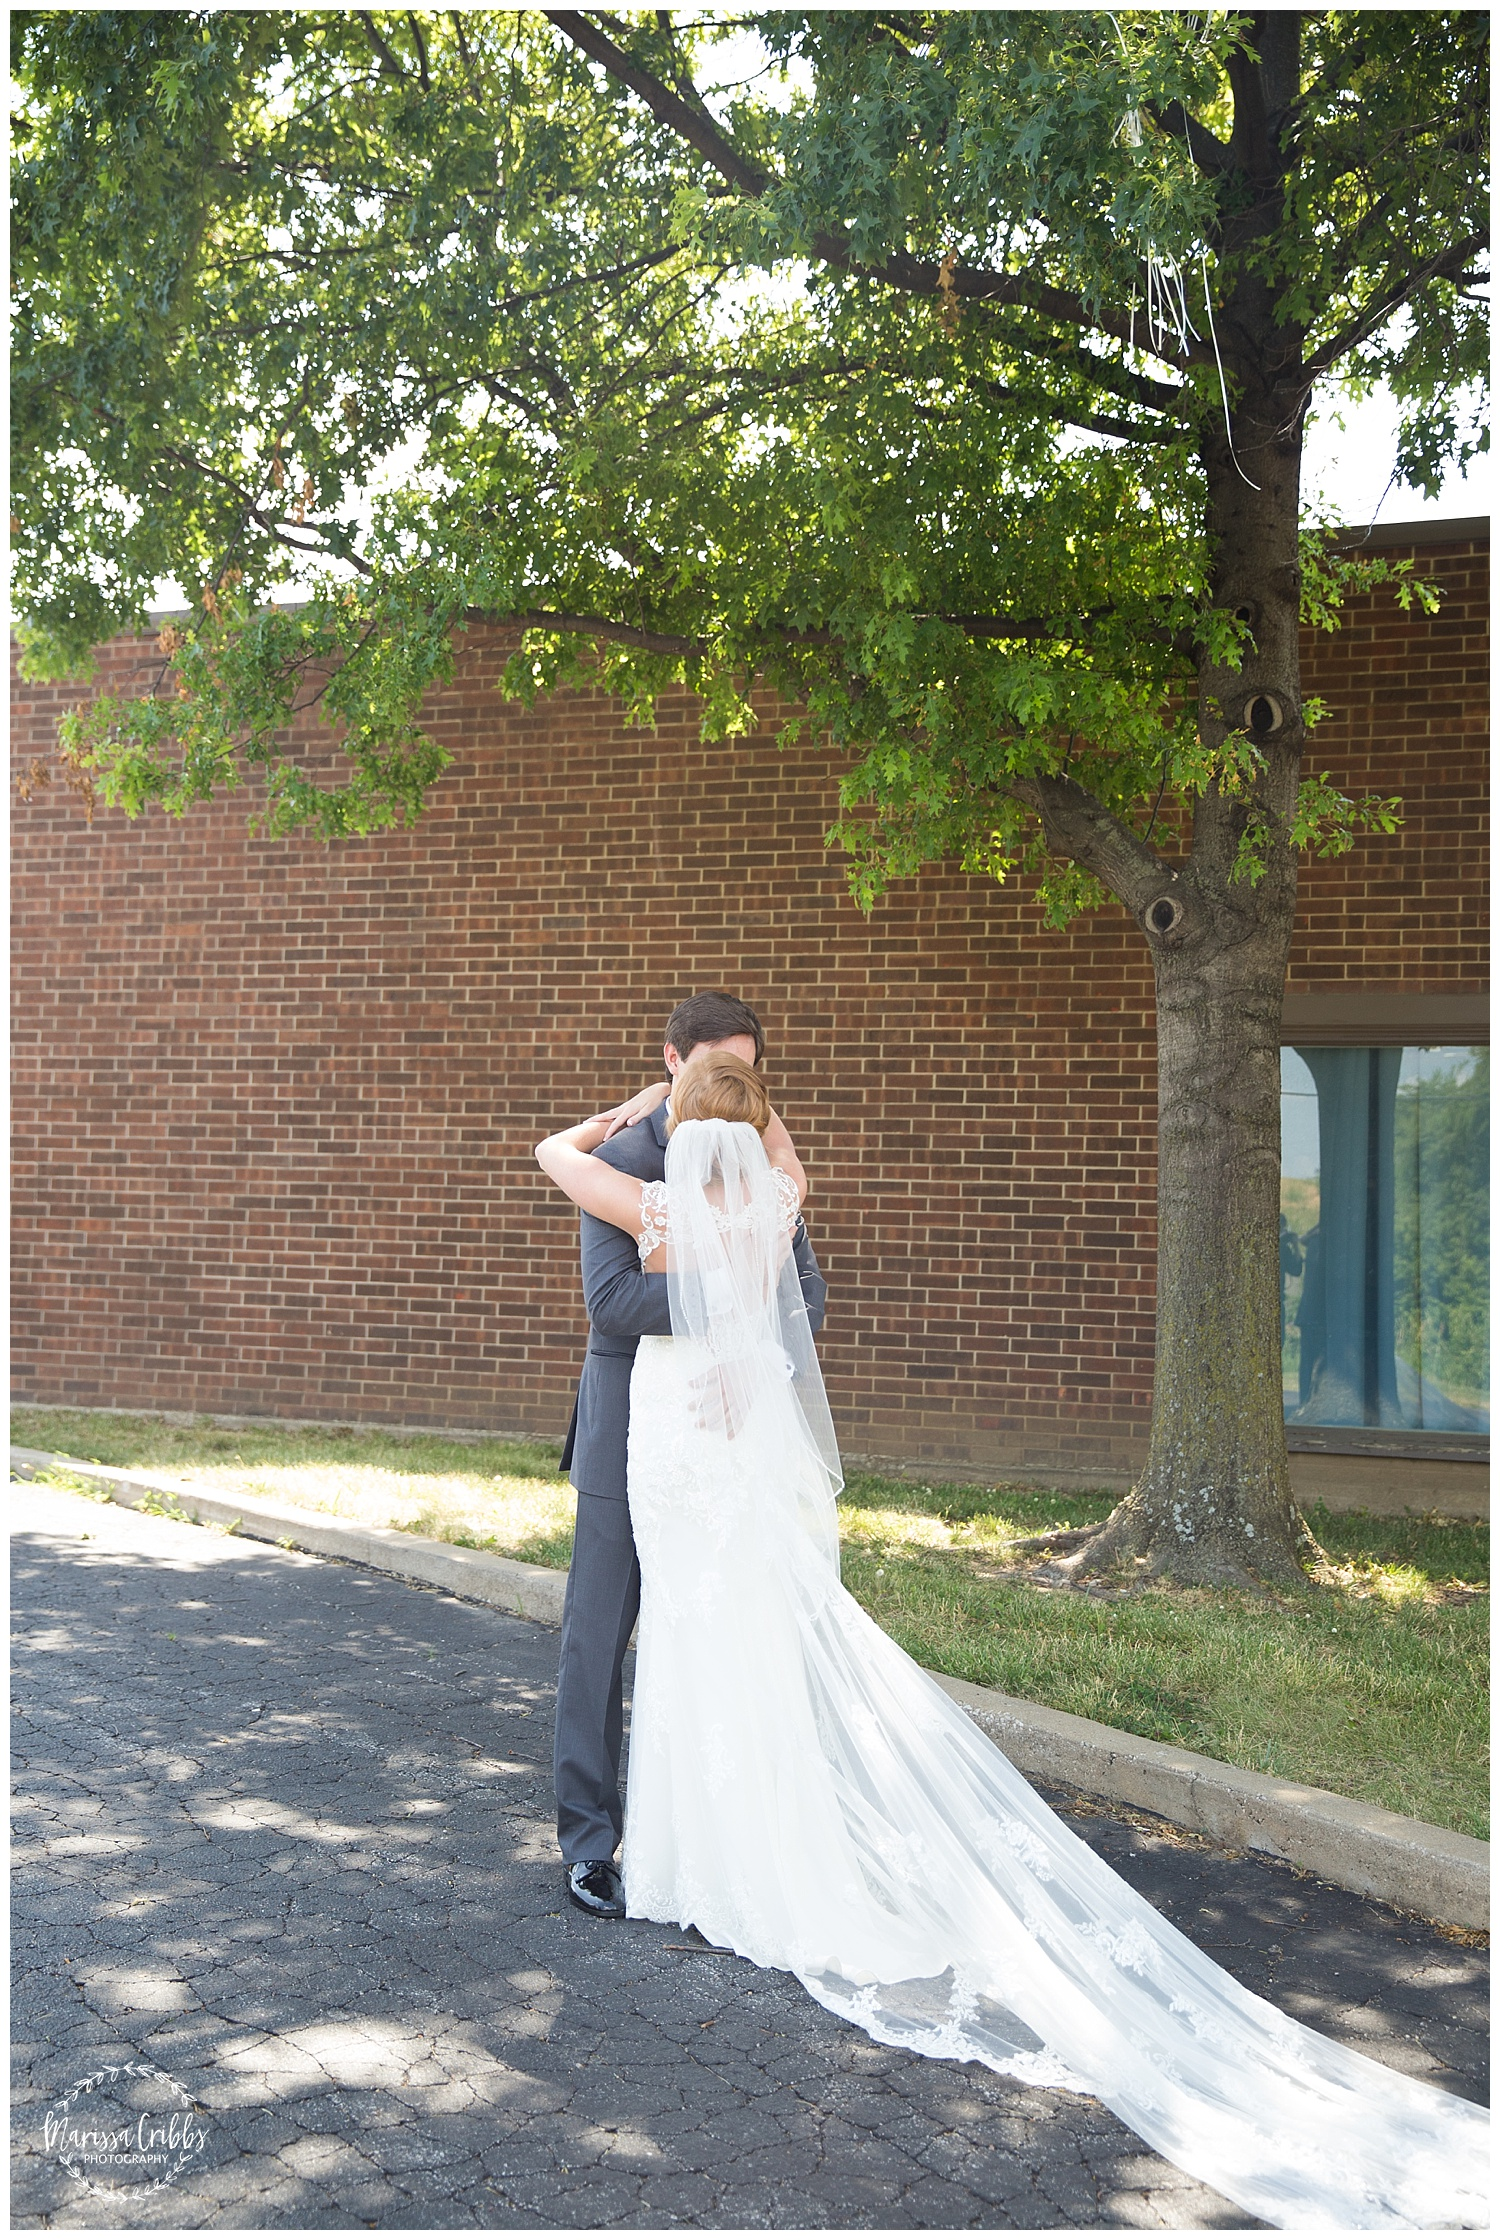 Twin Double Wedding | Union Horse Distilling Co. | Marissa Cribbs Photography | KC Weddings_0061.jpg